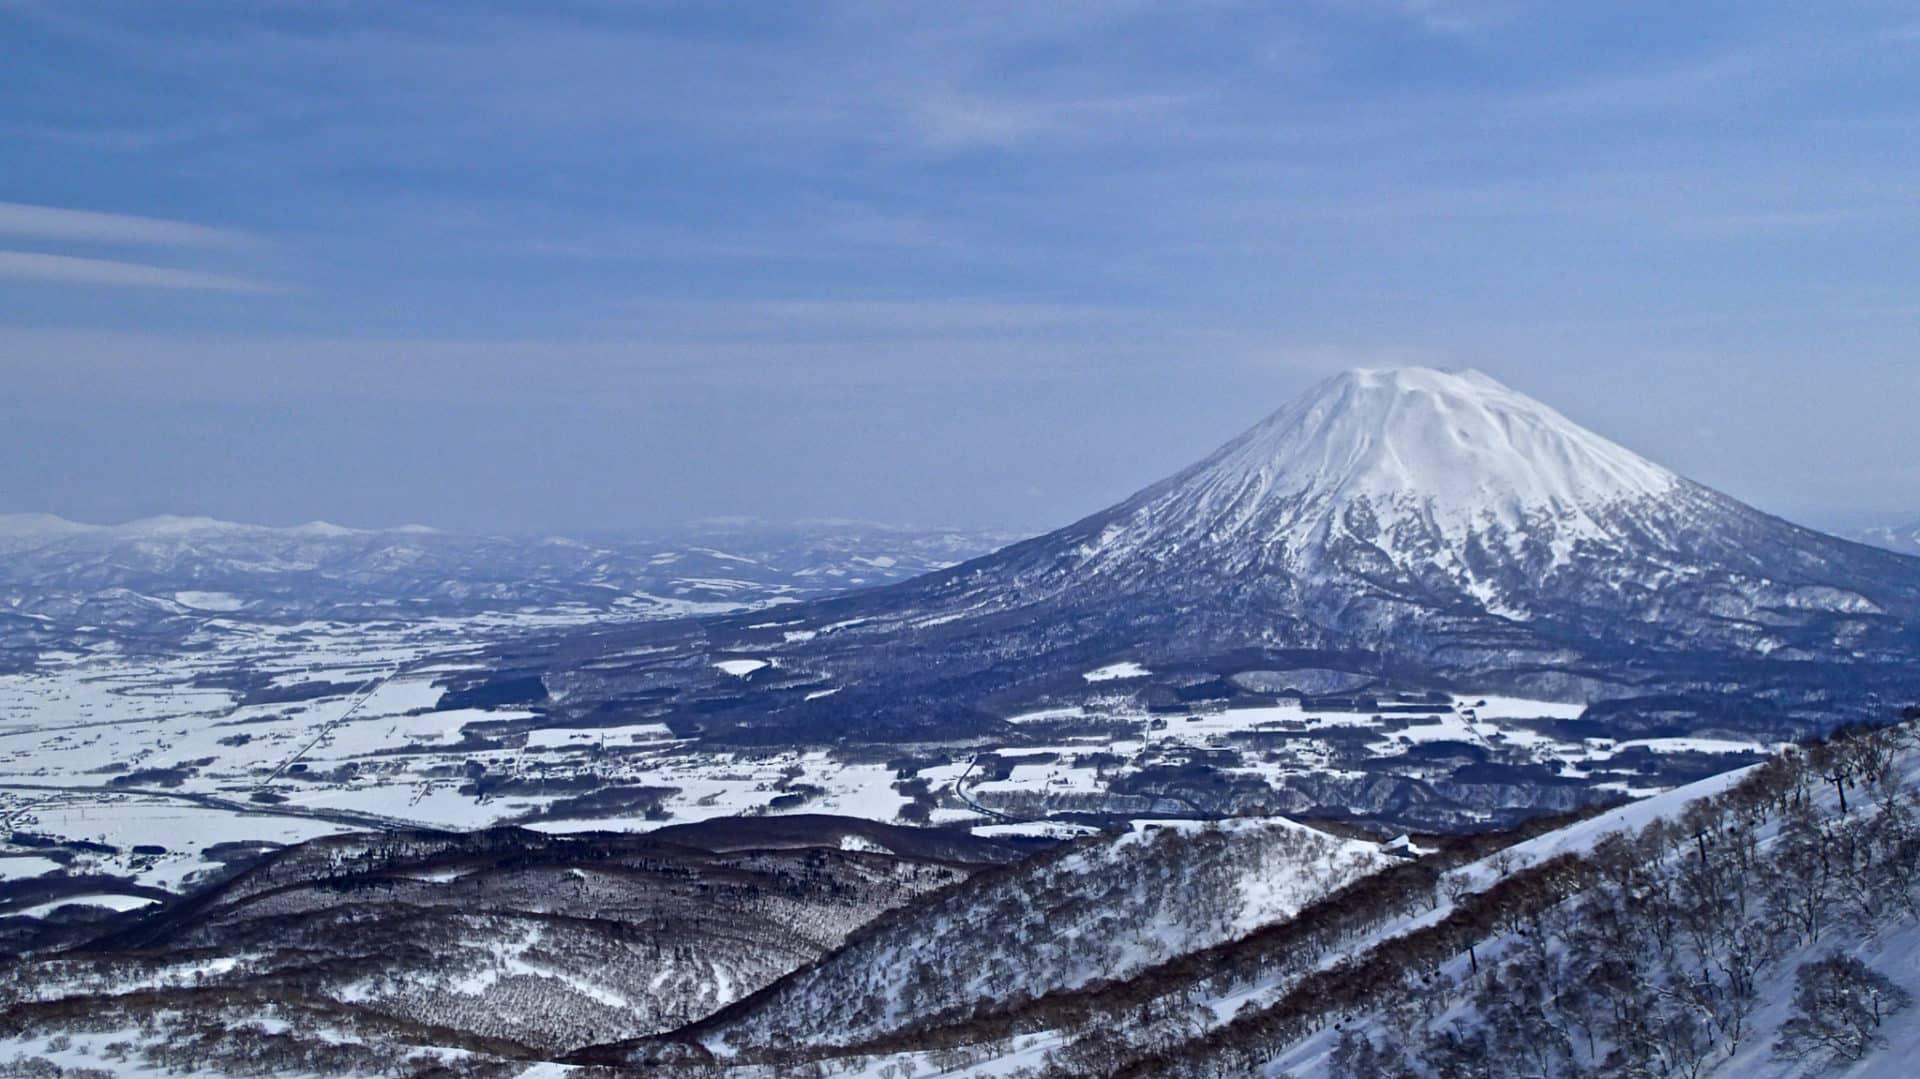 Ski touring on Mt Yotei, Hokkaido